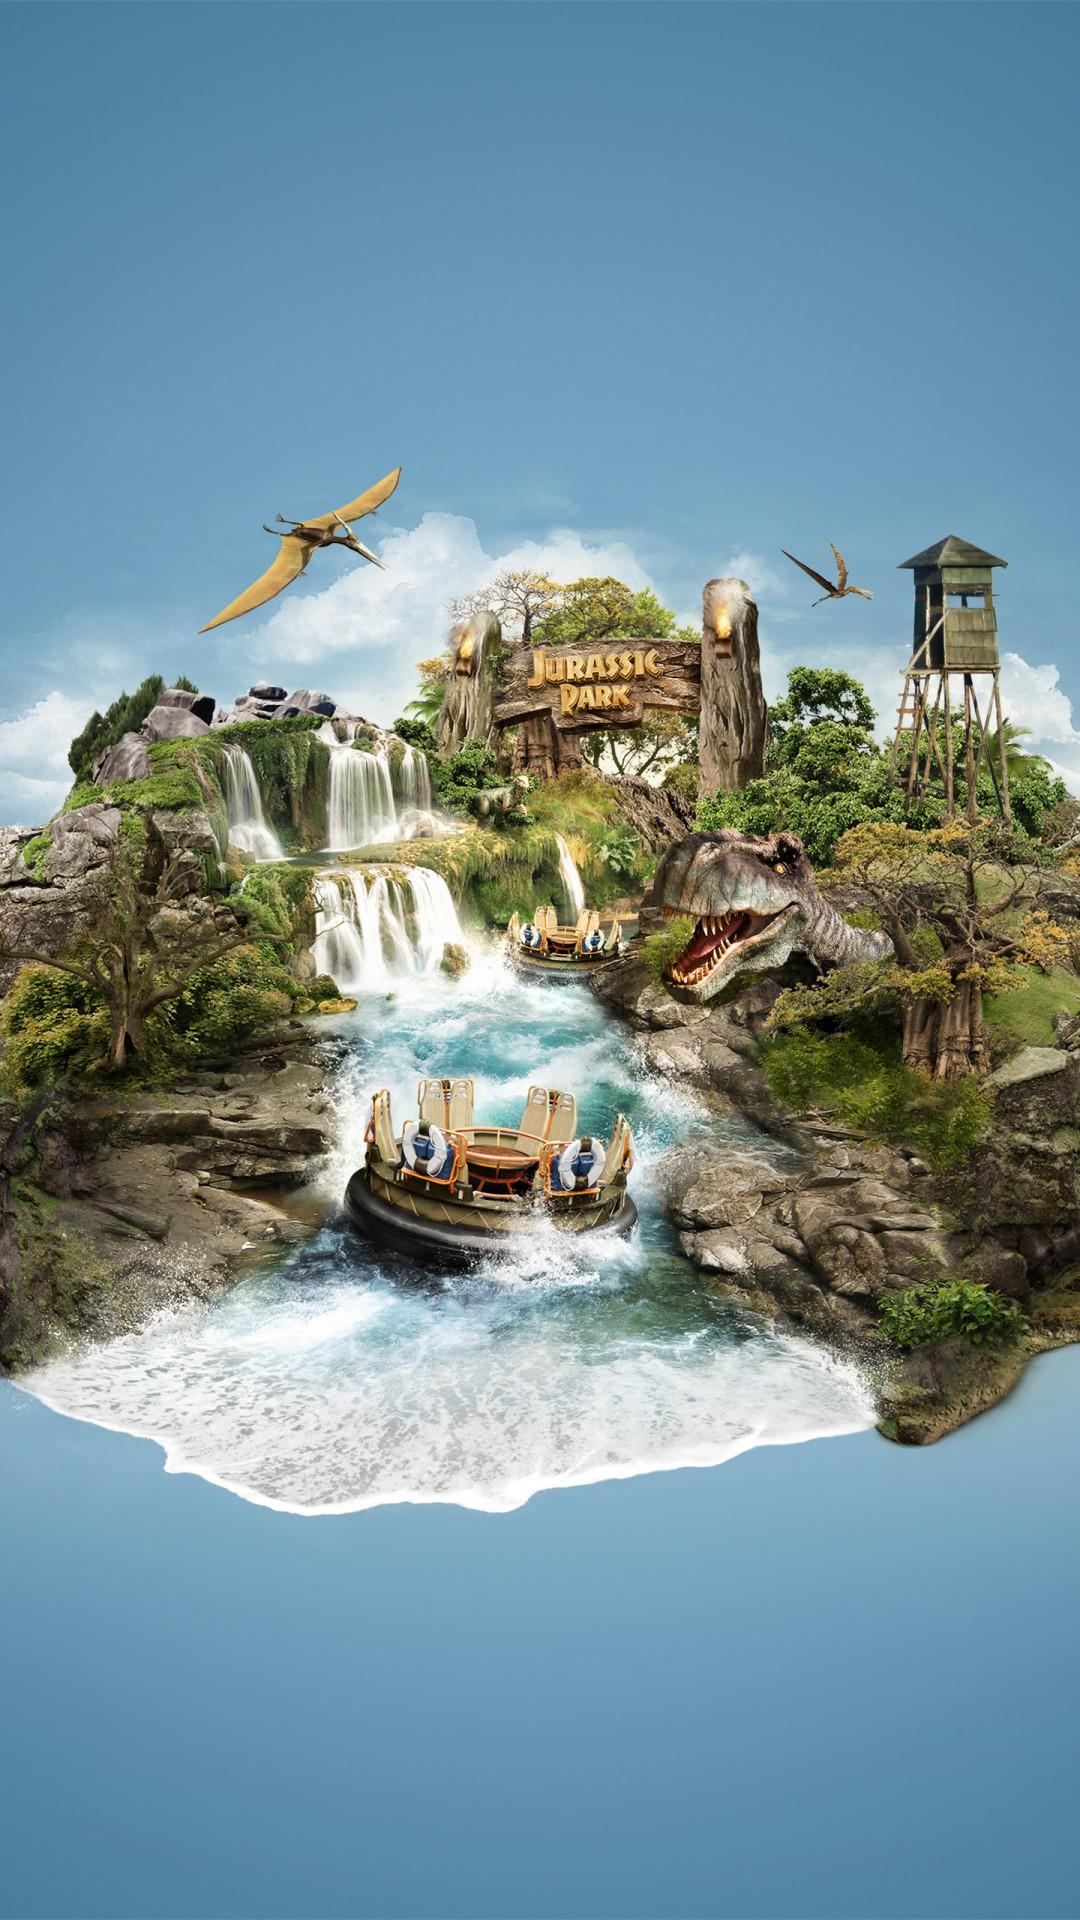 Wallpaper Hd For Ipad Pro Jurassic Park Island Wallpapers Hd Wallpapers Id 23946